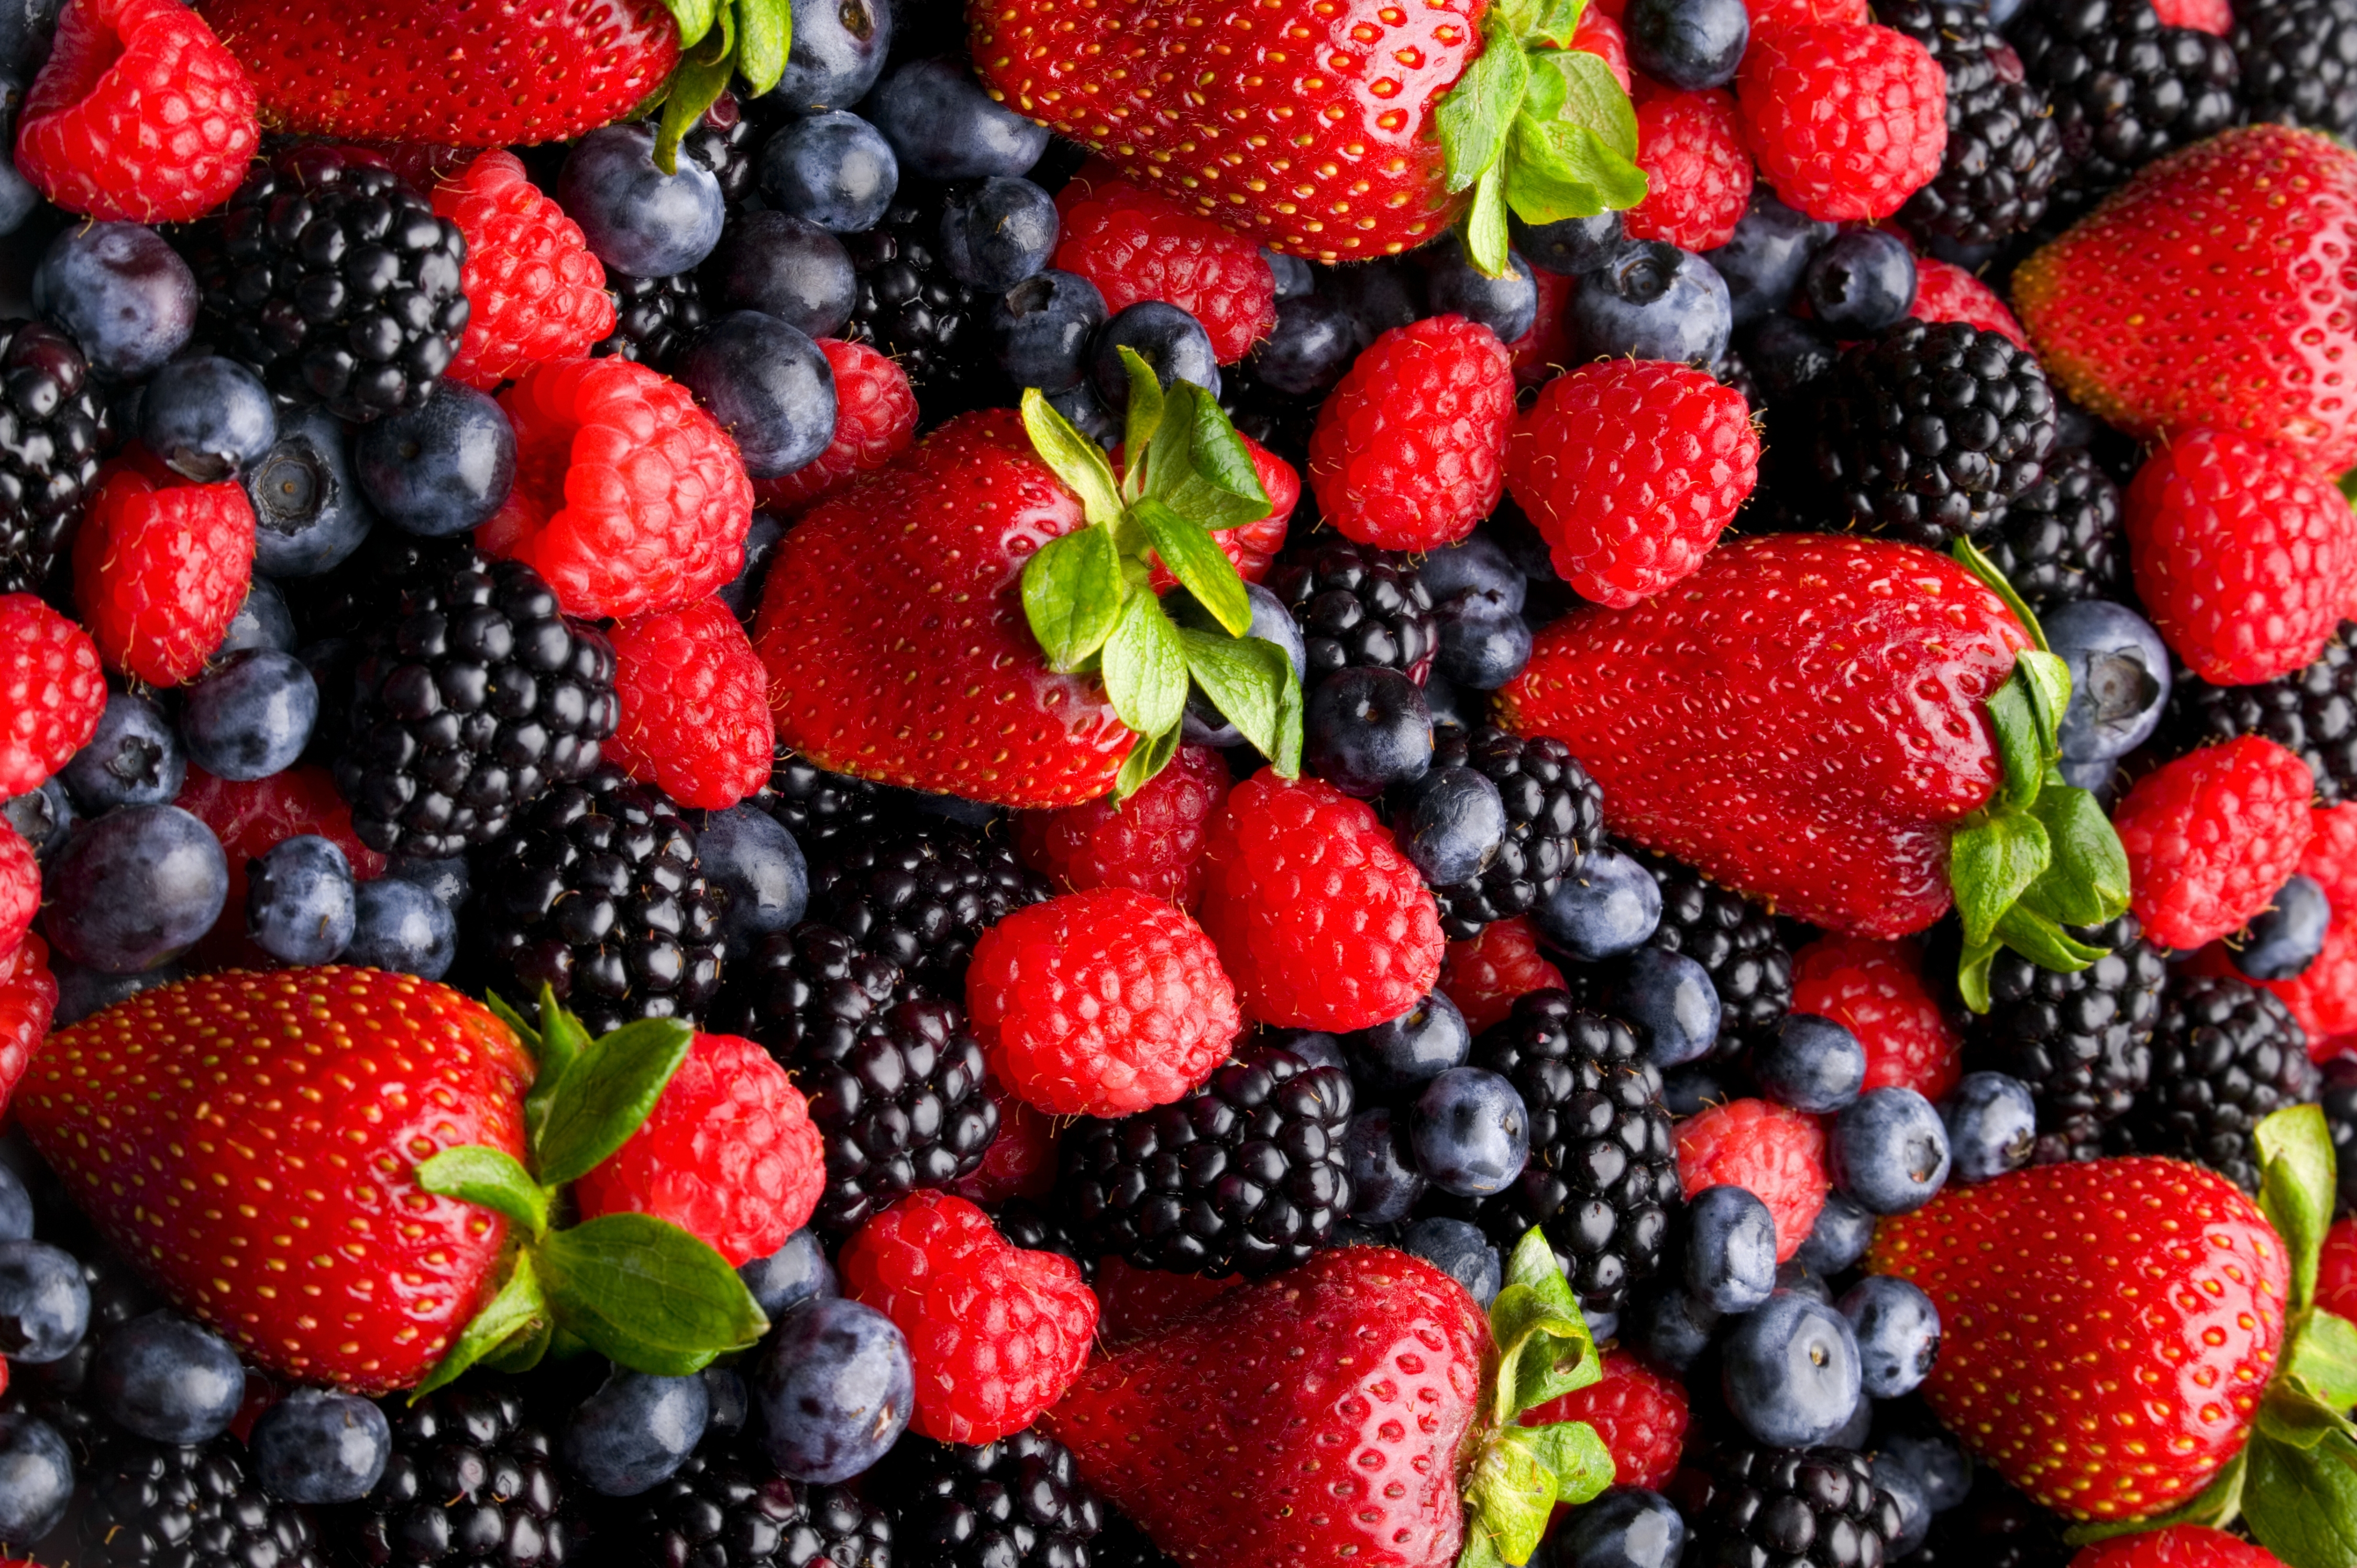 клубника-малина ягода фото